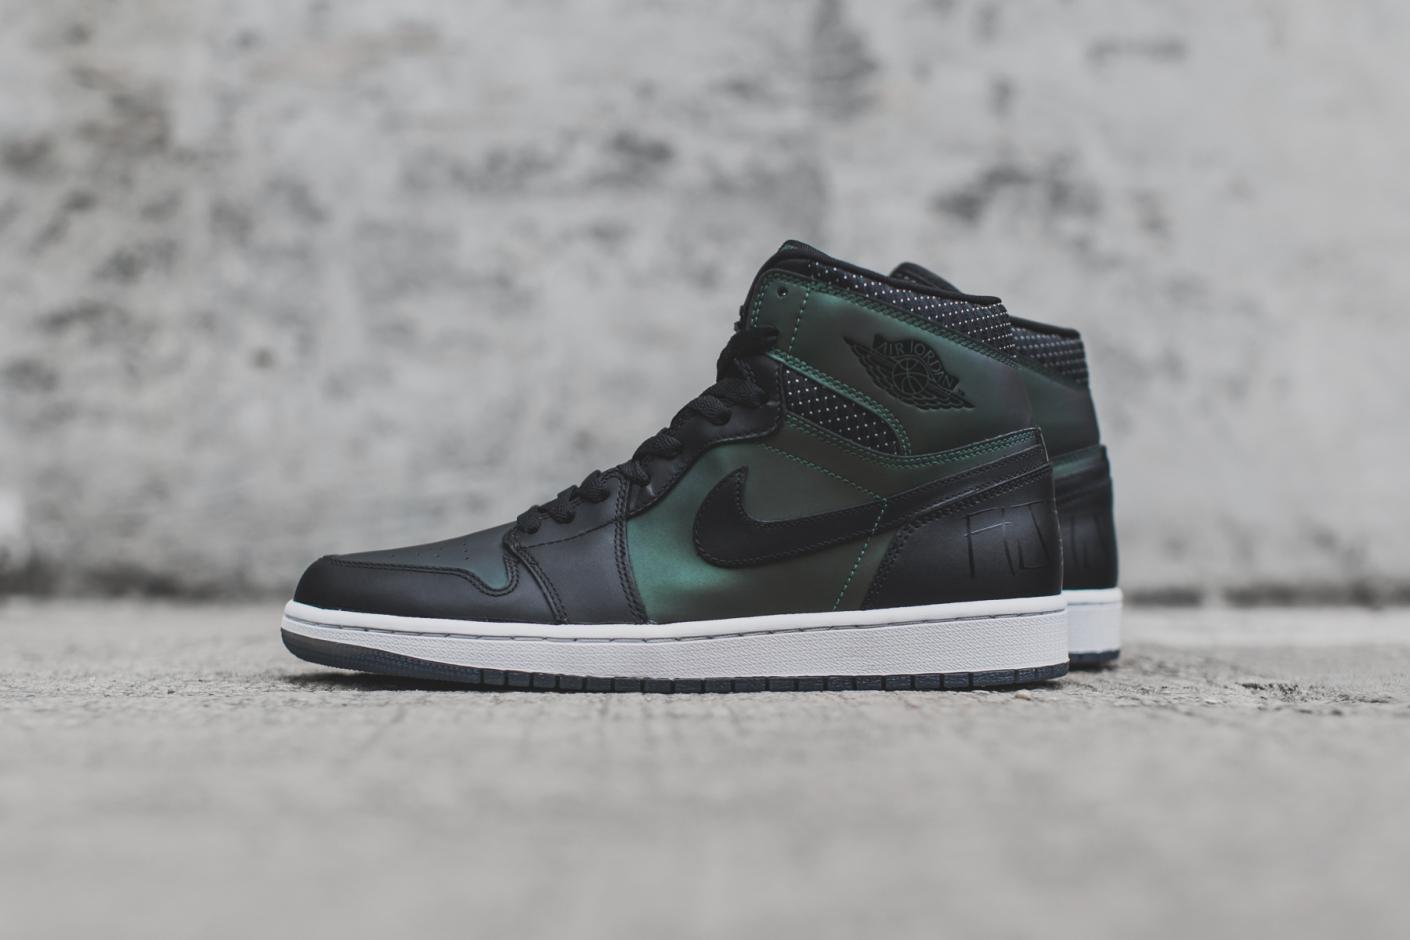 Nike SB x Air Jordan 1 by Craig Stecyk 1